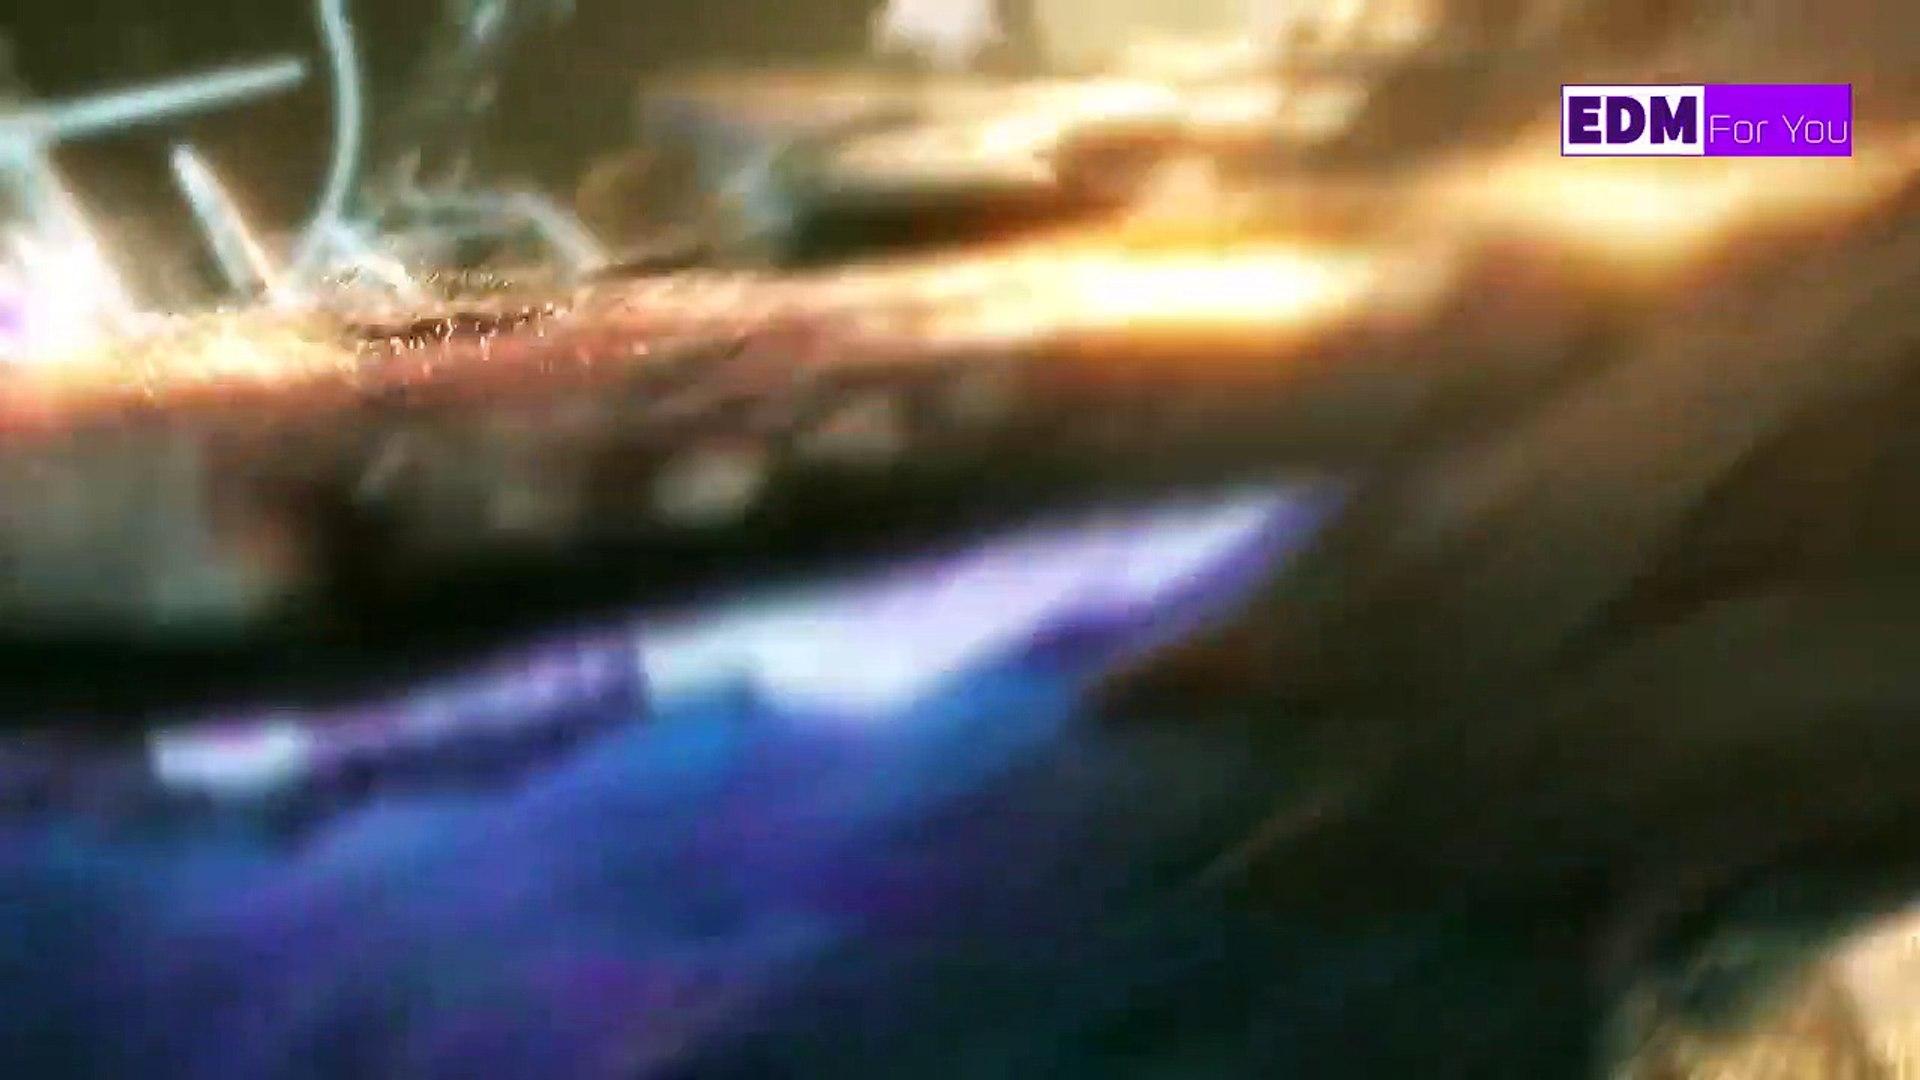 New Songs Alan Walker (Remix) - Top Alan Walker Style 2021 - Animation Music Video [GMV] (1)